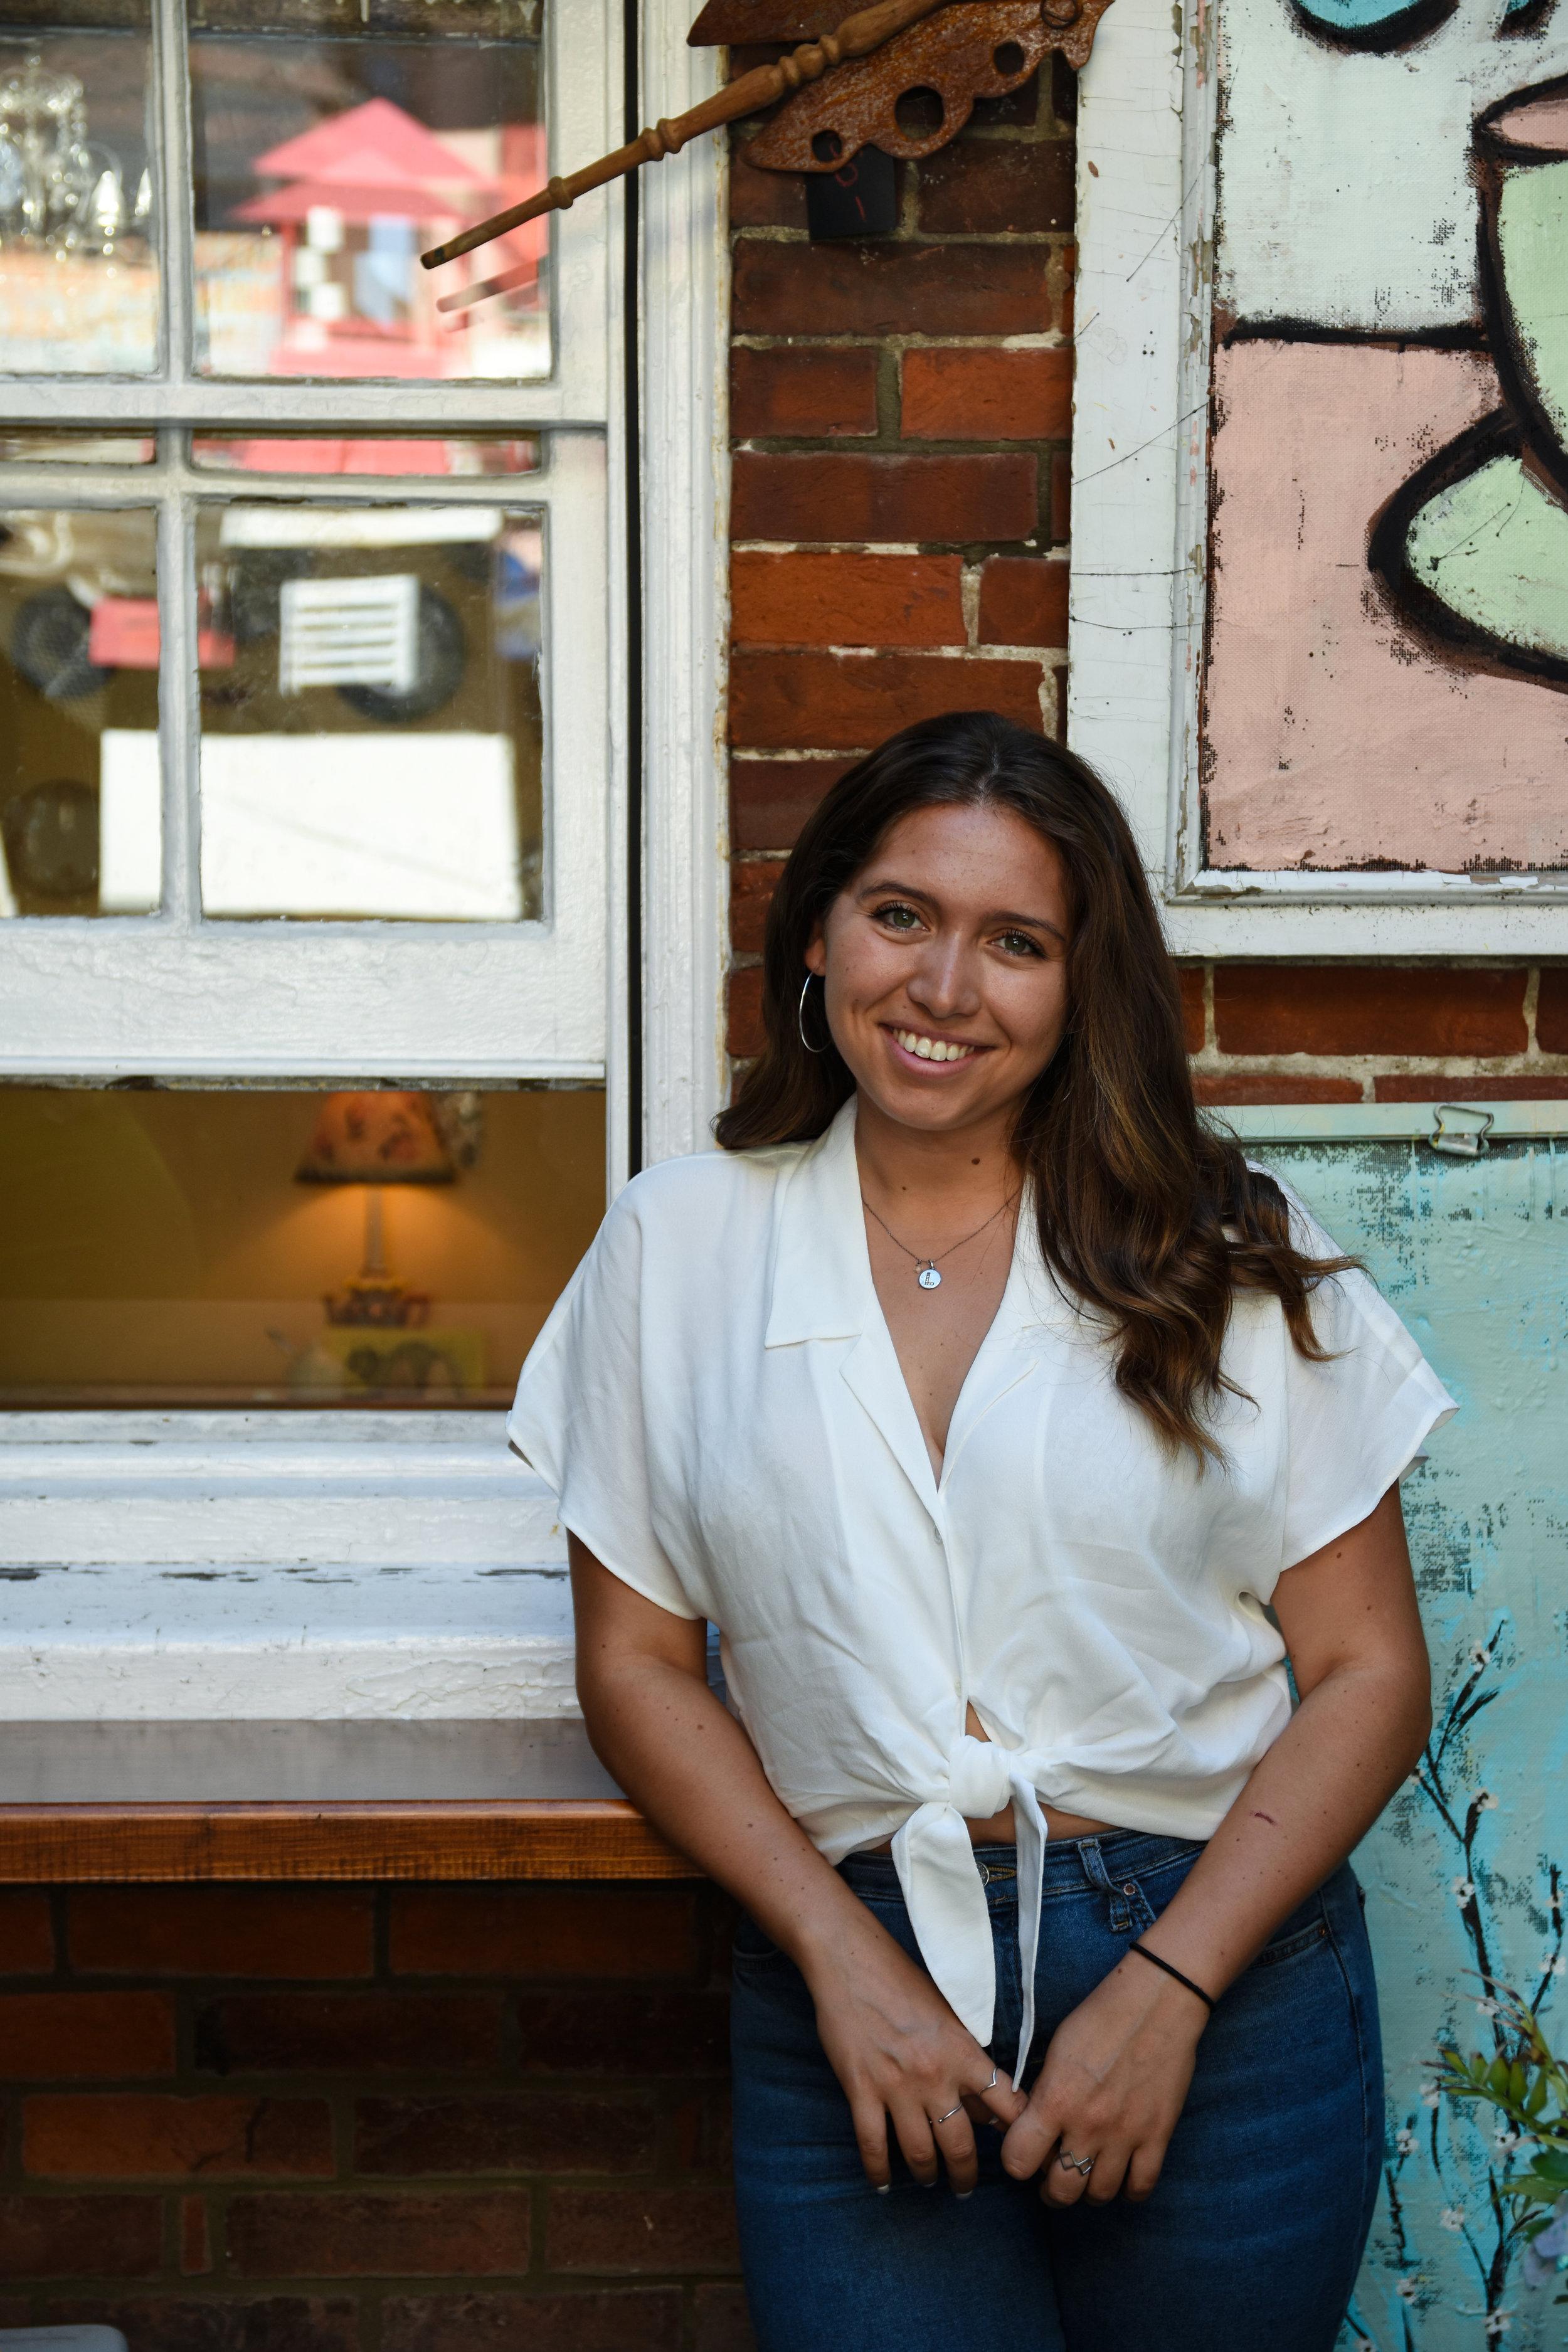 Laura Rubino / Head of Clothing